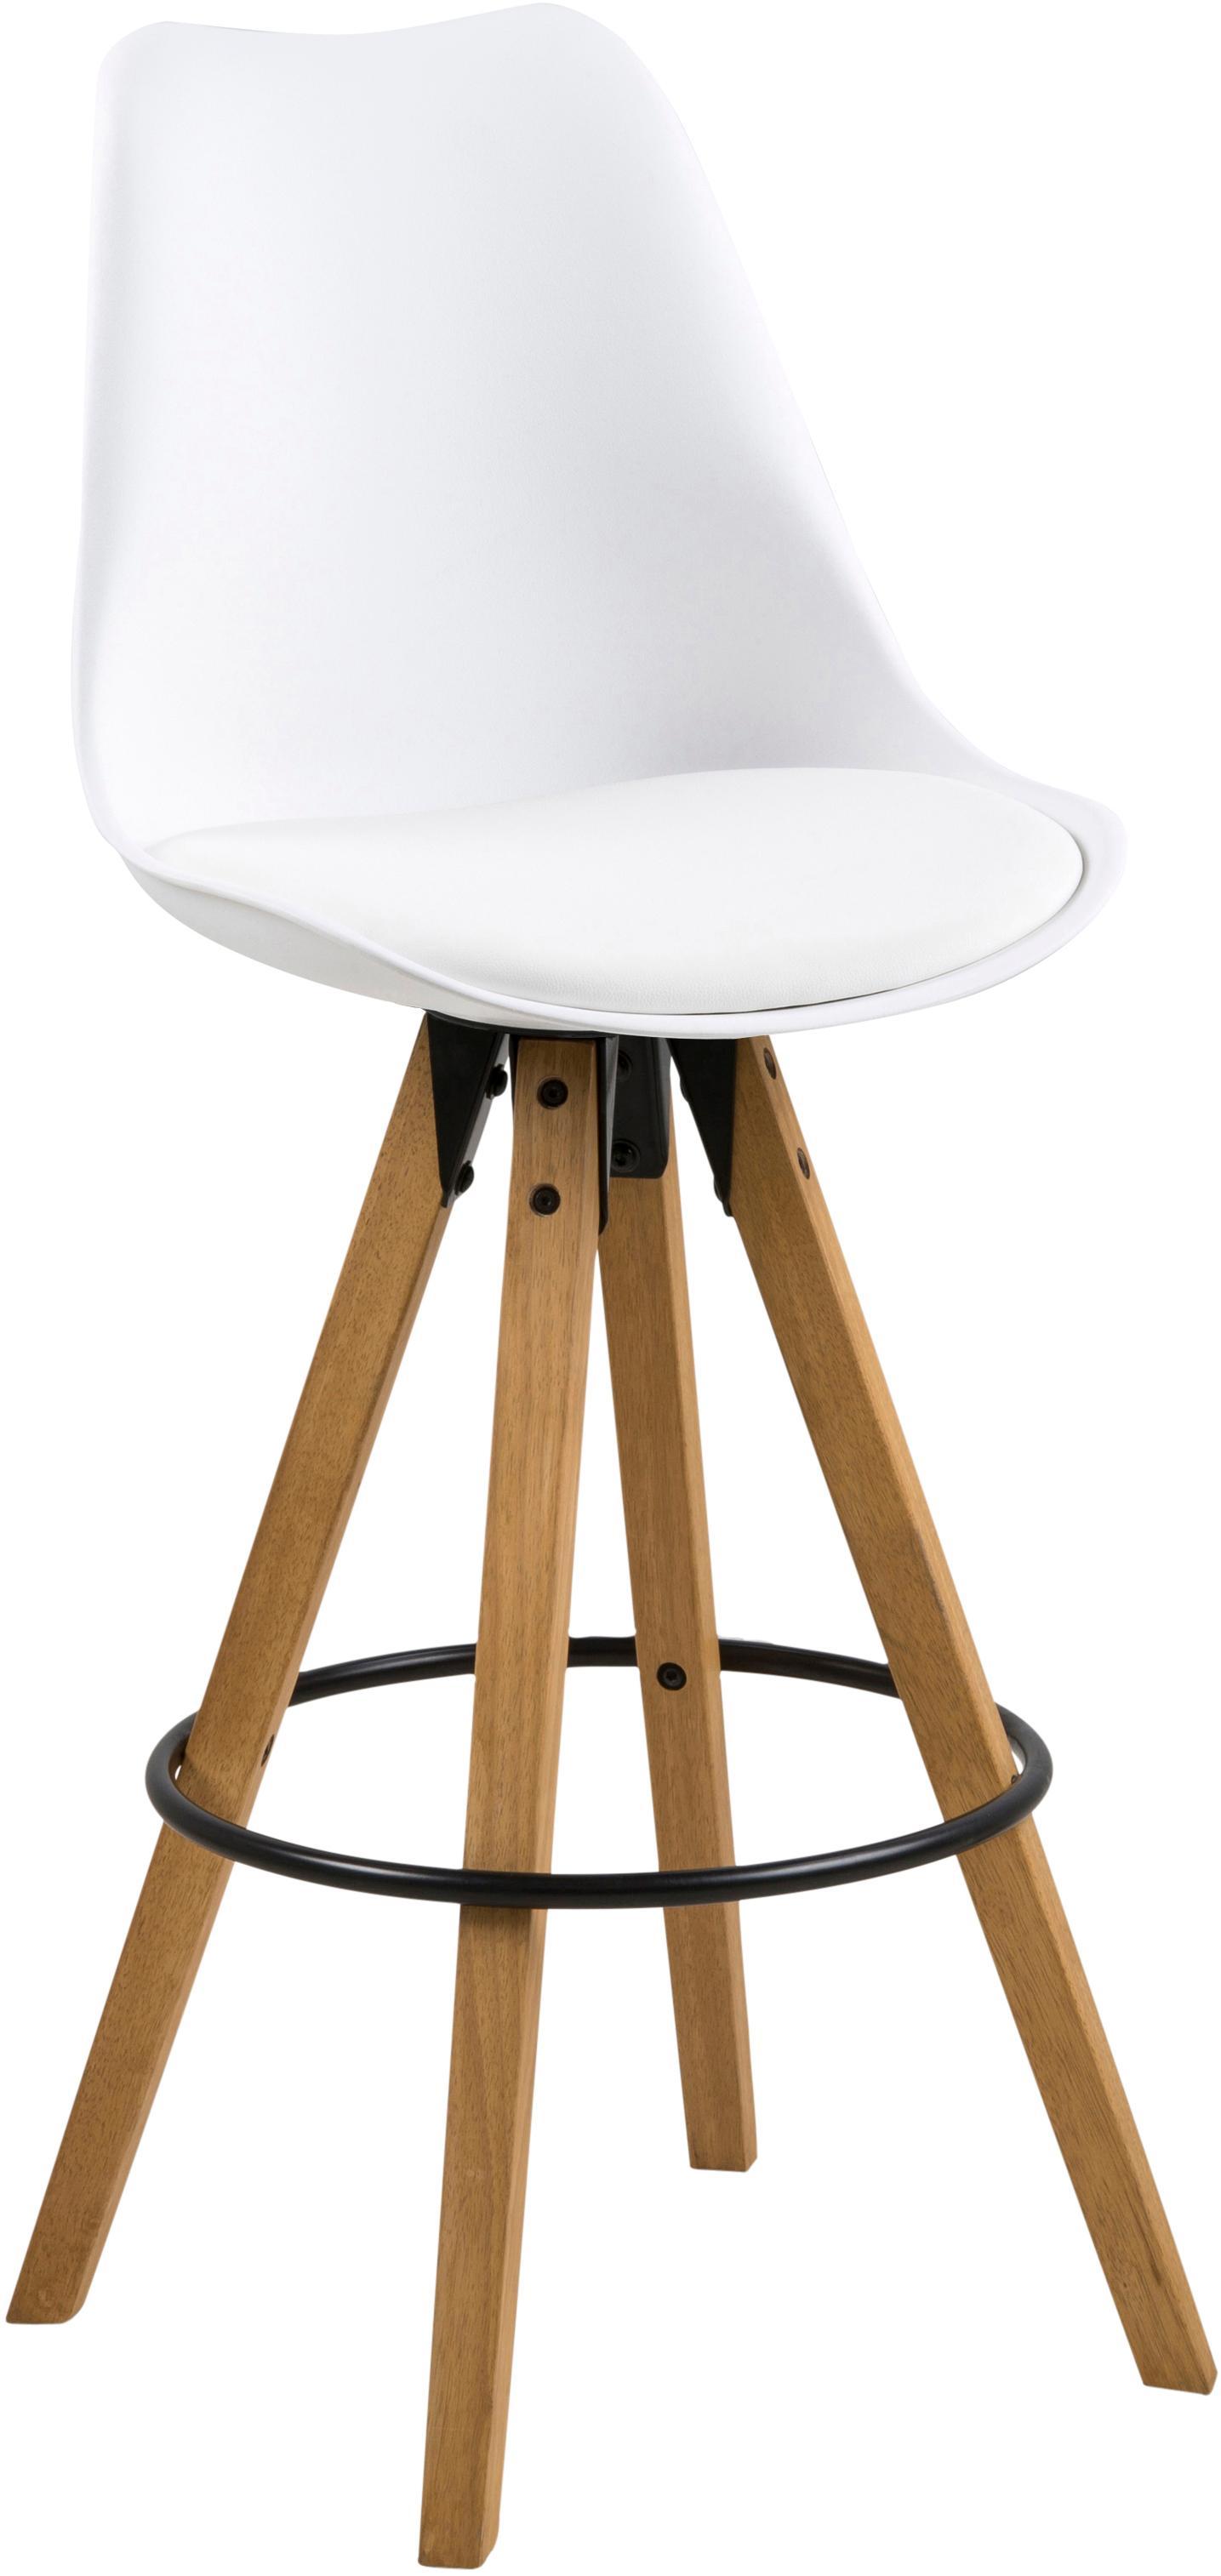 Barstühle Dima, 2 Stück, Sitzschale: Polyurethan, Bezug: Polyester, Beine: Gummibaumholz, geölt, Sitzschale: Weiß<br>Beine: Gummibaumholz<br>Fußstütze: Schwarz, 49 x 112 cm